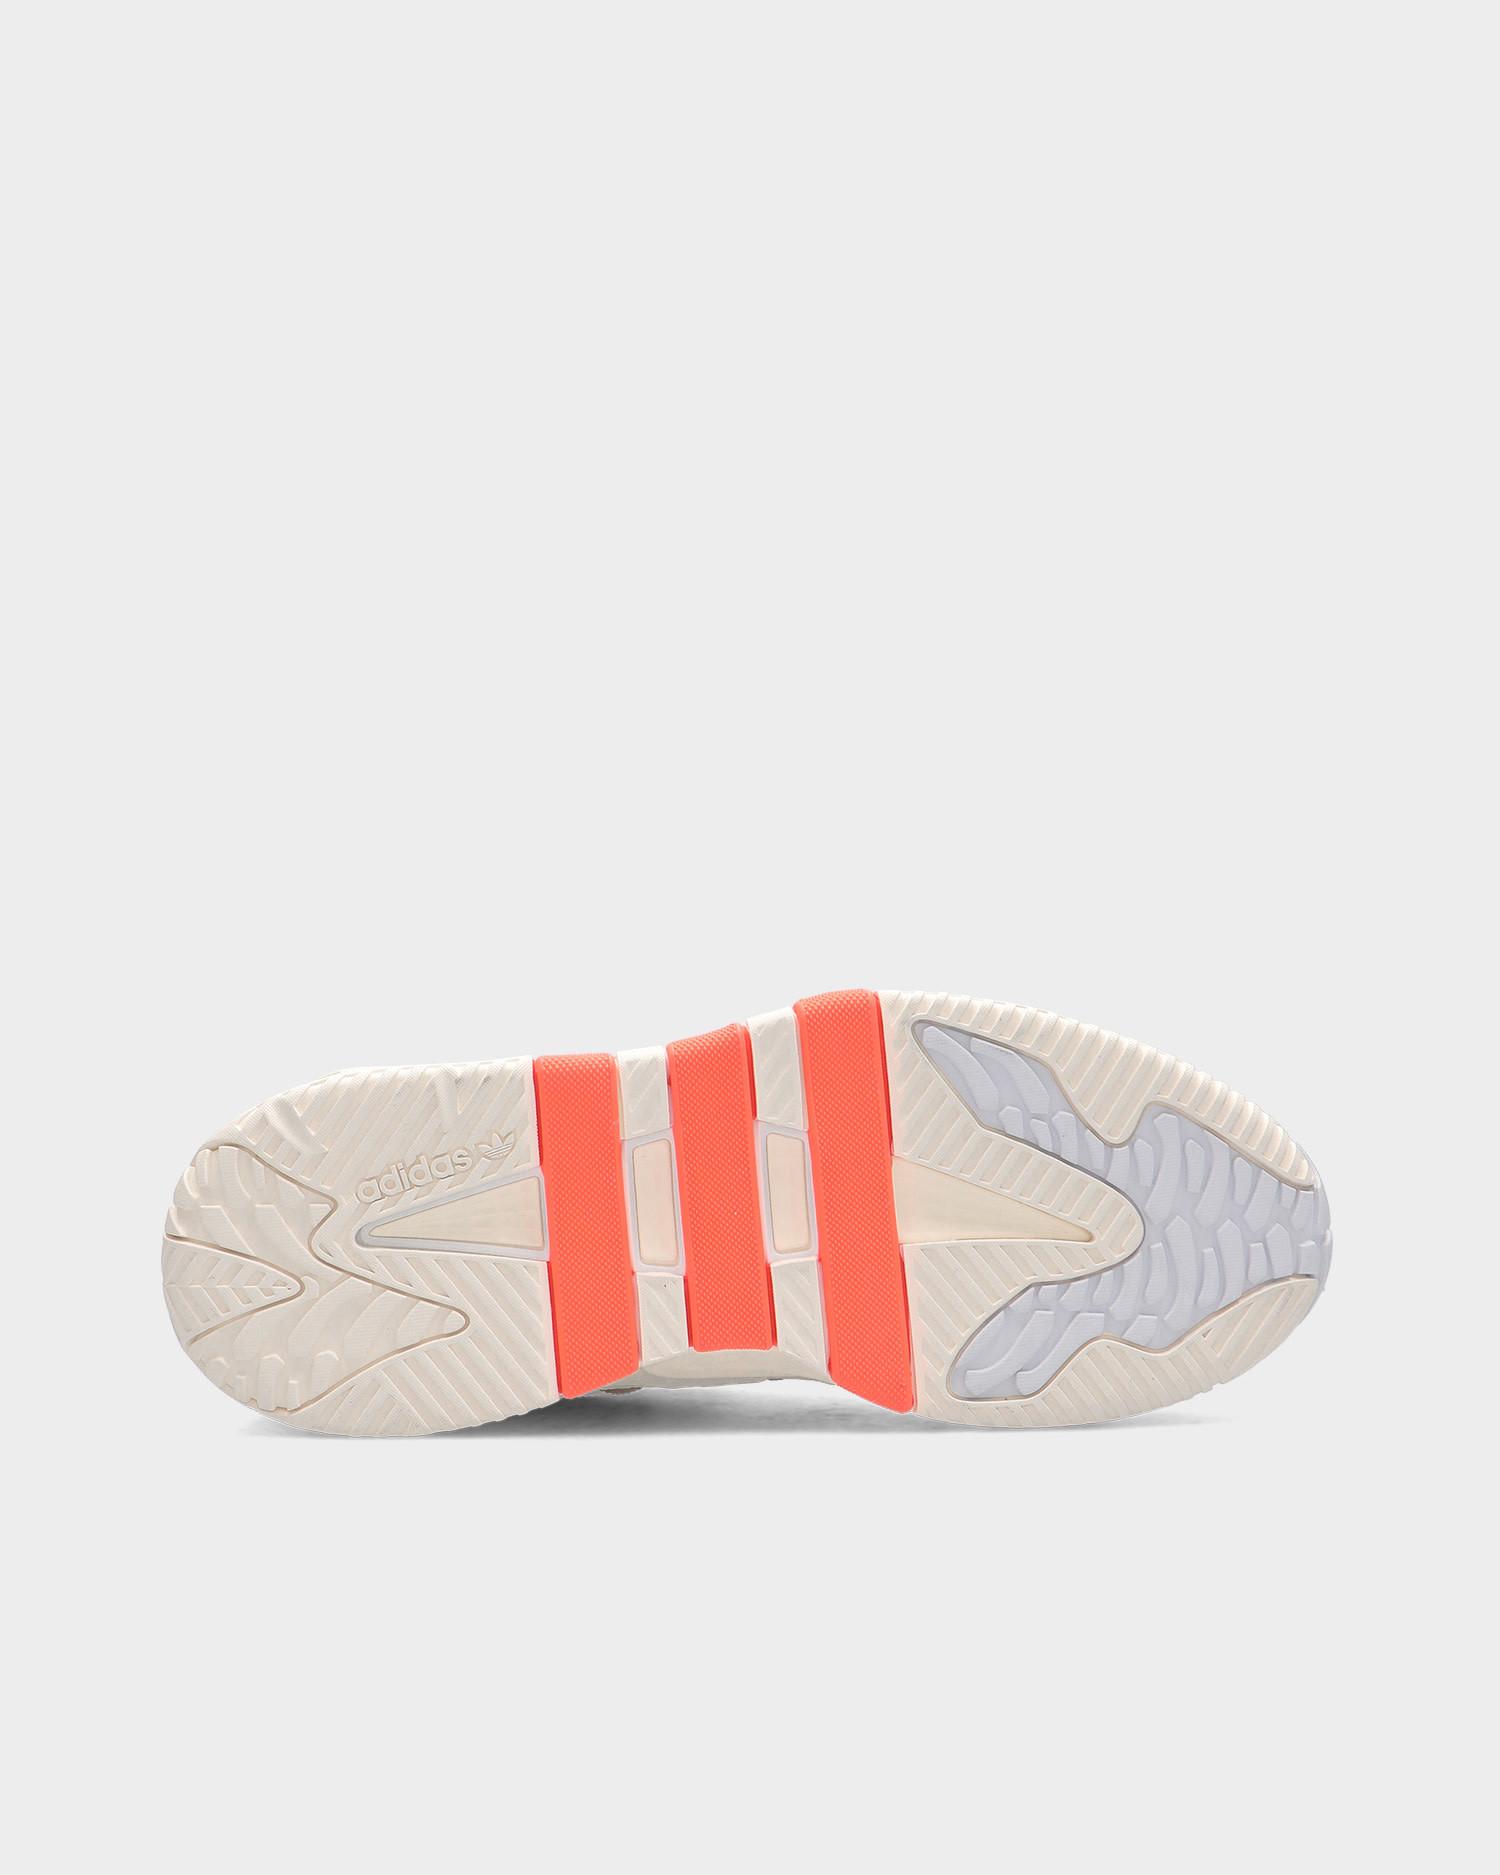 Adidas Niteball Greon/Cwhite/Ftwwht